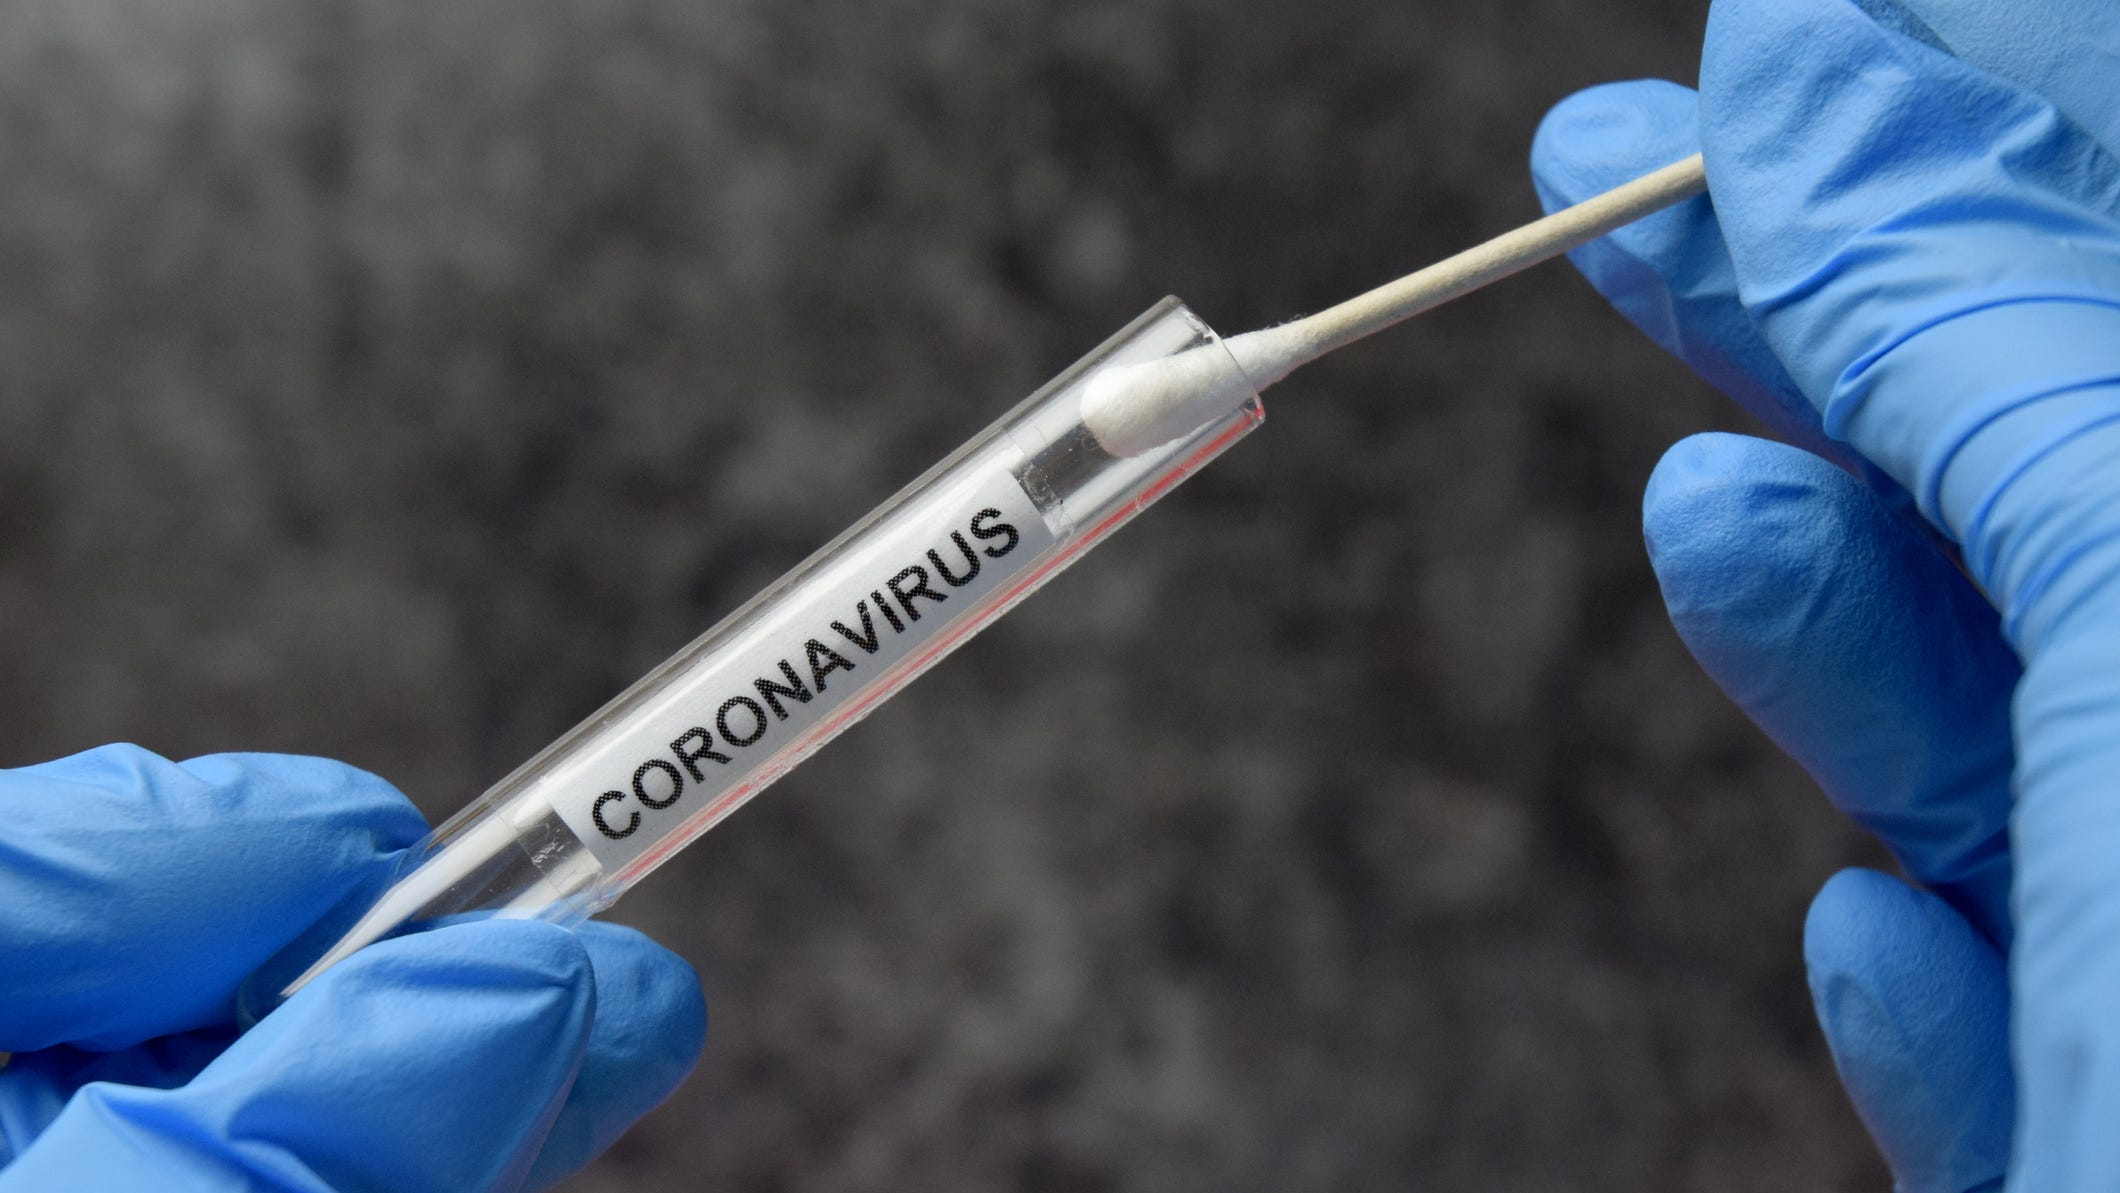 Iowa reports 13 COVID-19 deaths, 1,661 confirmed coronavirus cases - Des Moines Register